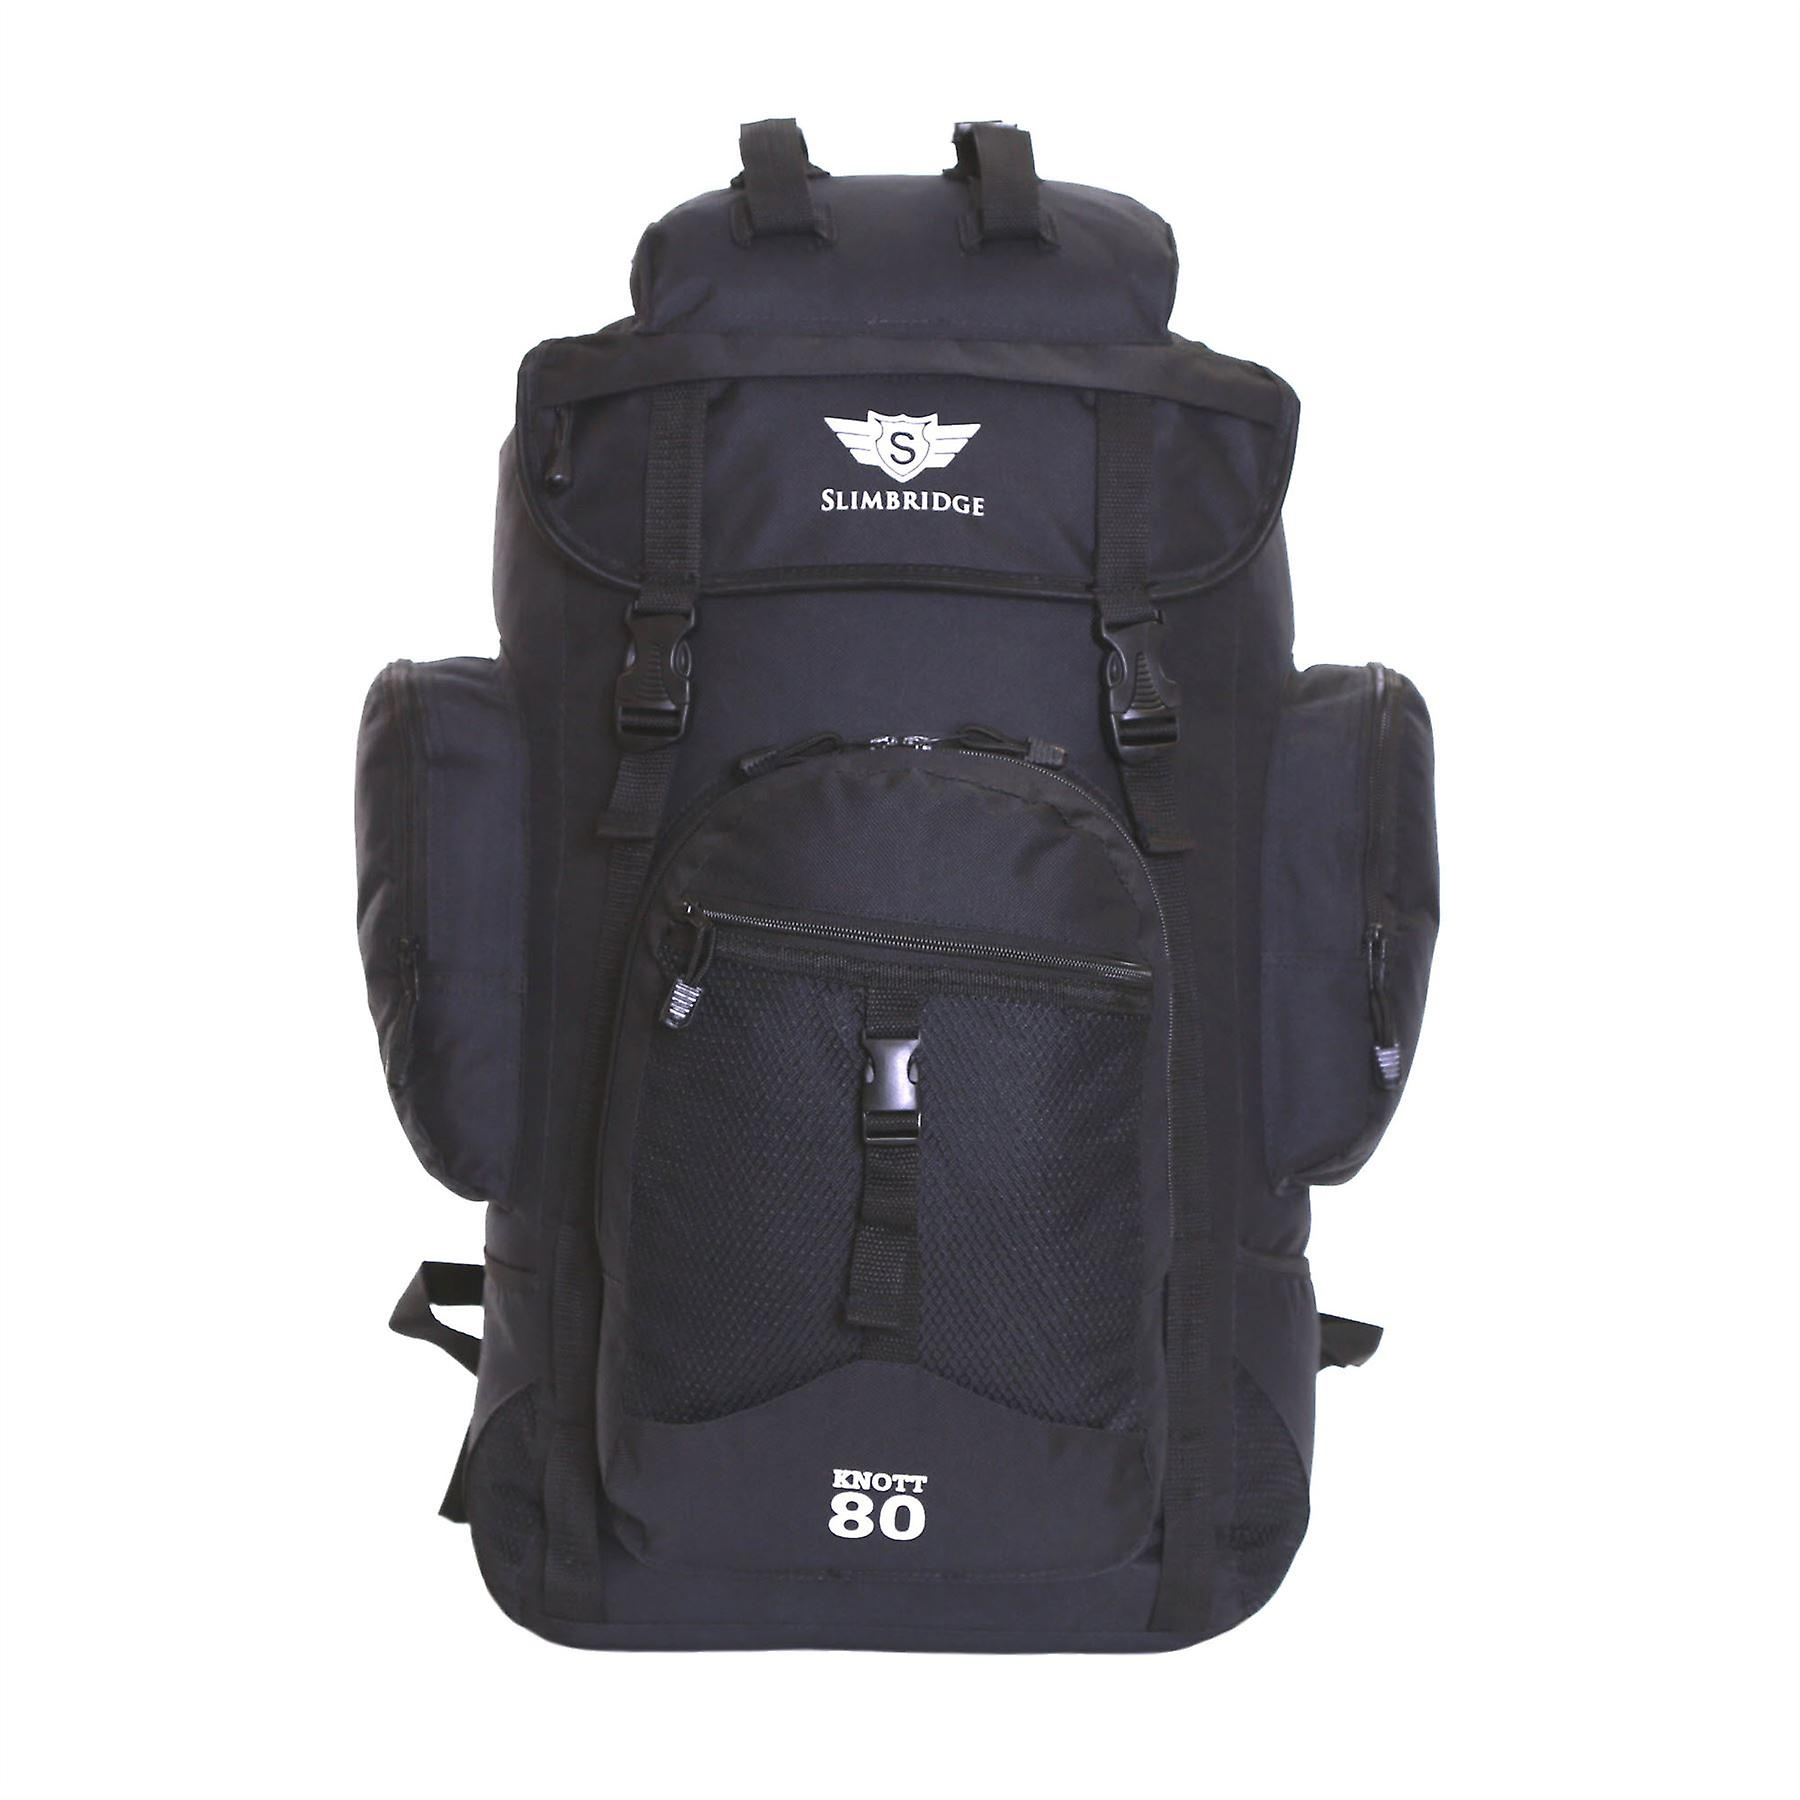 Slimbridge Knott 45 Litre Hiking Backpack, Black